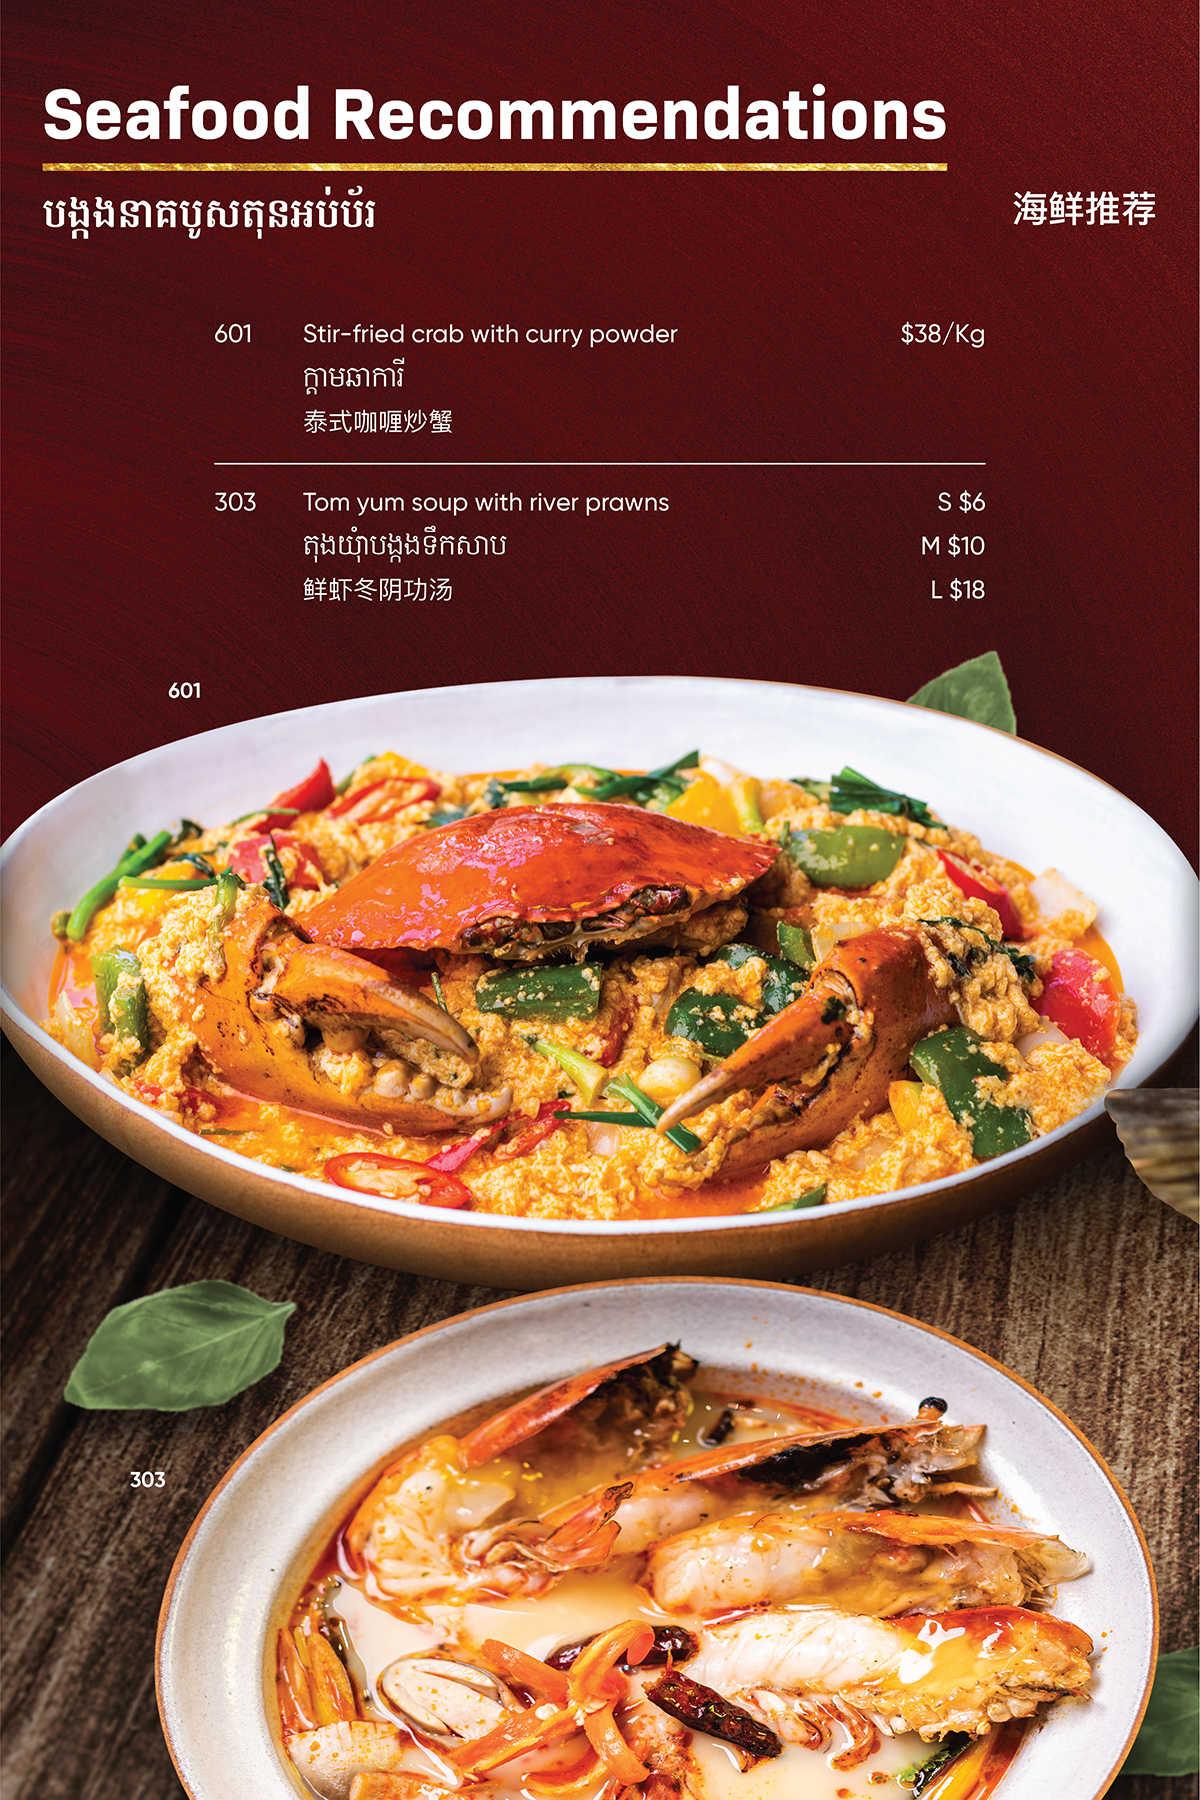 Kuang Seafood - Curry Crab